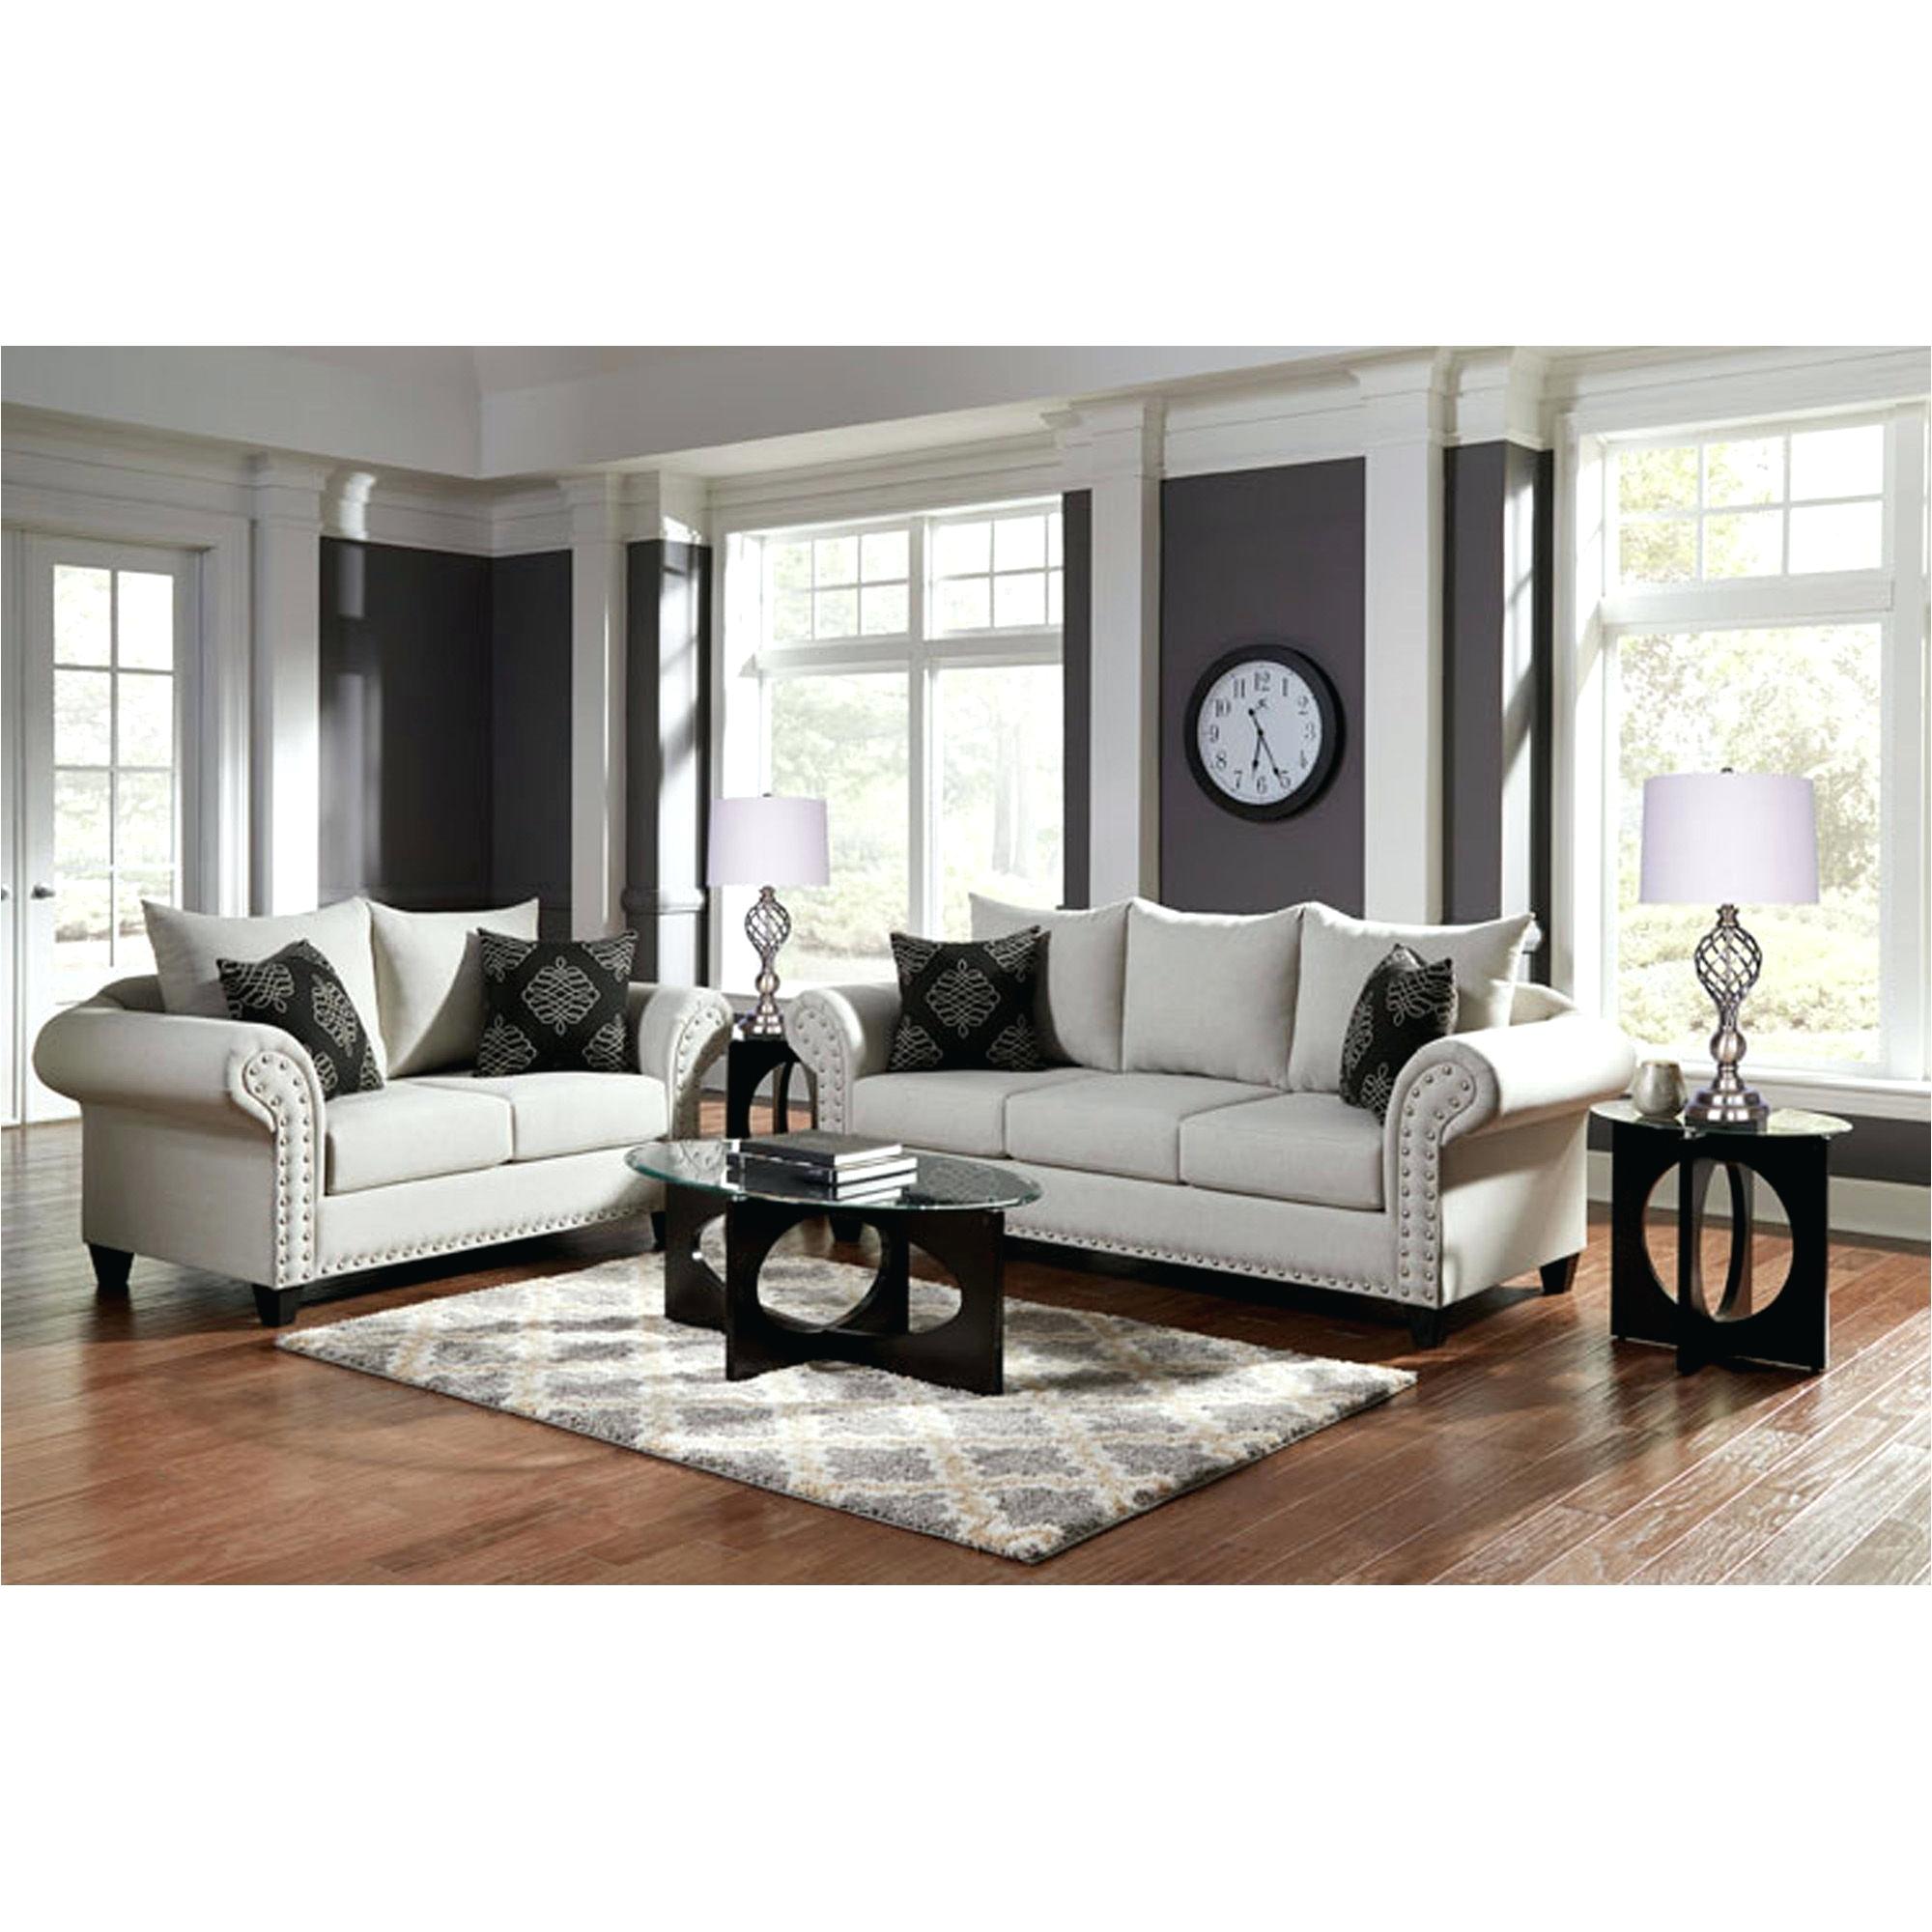 Used Furniture Baton Rouge Woodhaven Furniture Industries Furniture Baton Rouge Used Furniture